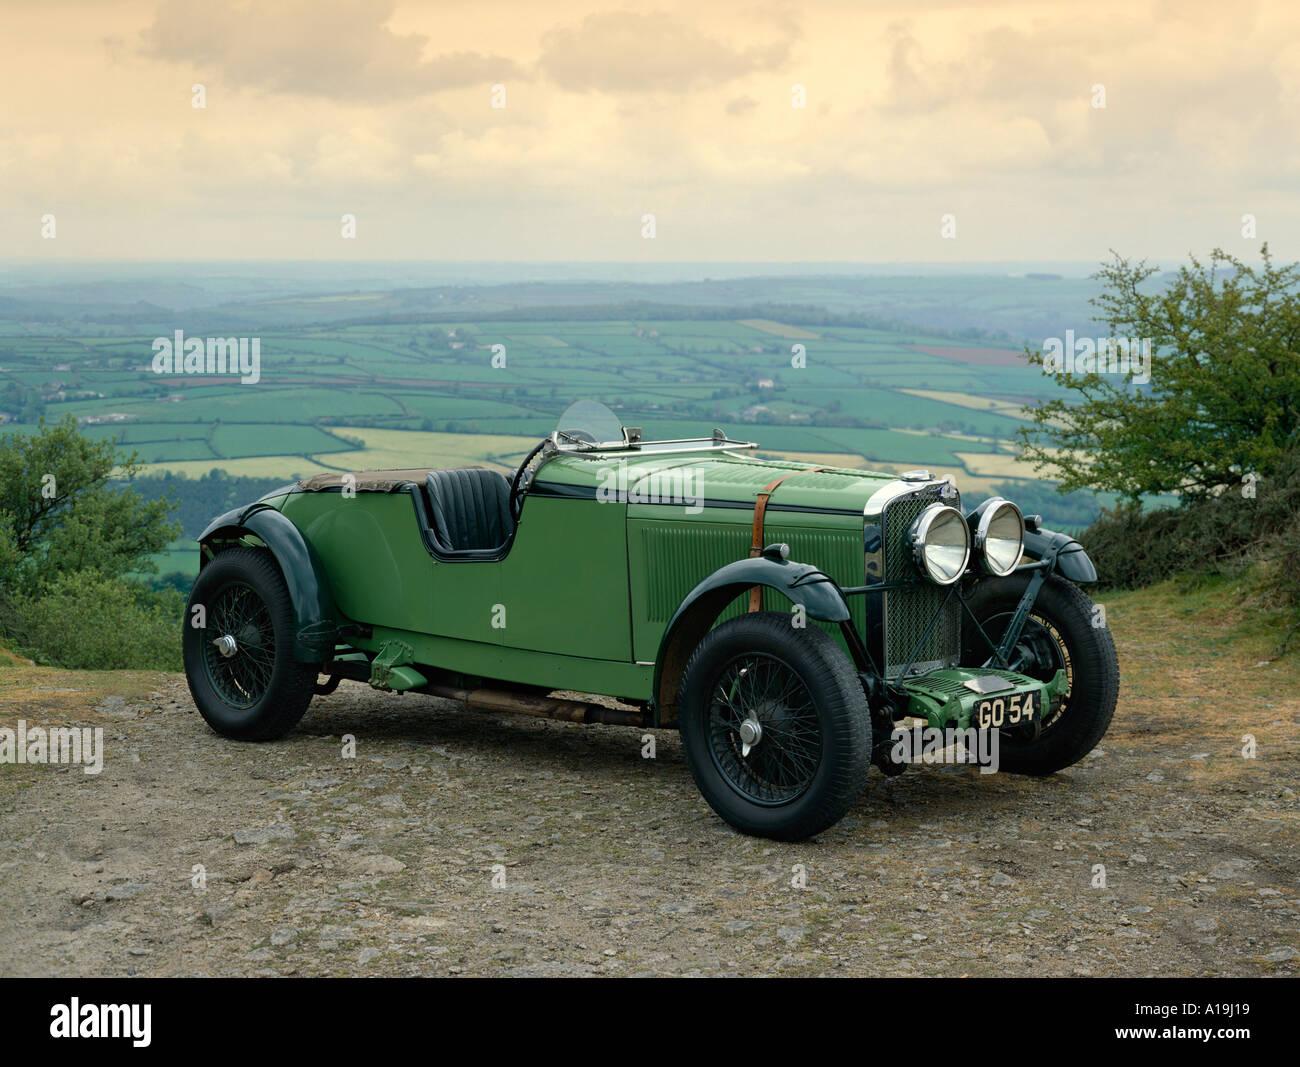 1931 Talbot 105 3 0 litre racing team car Reg GO54 Country of origin United Kingdom - Stock Image